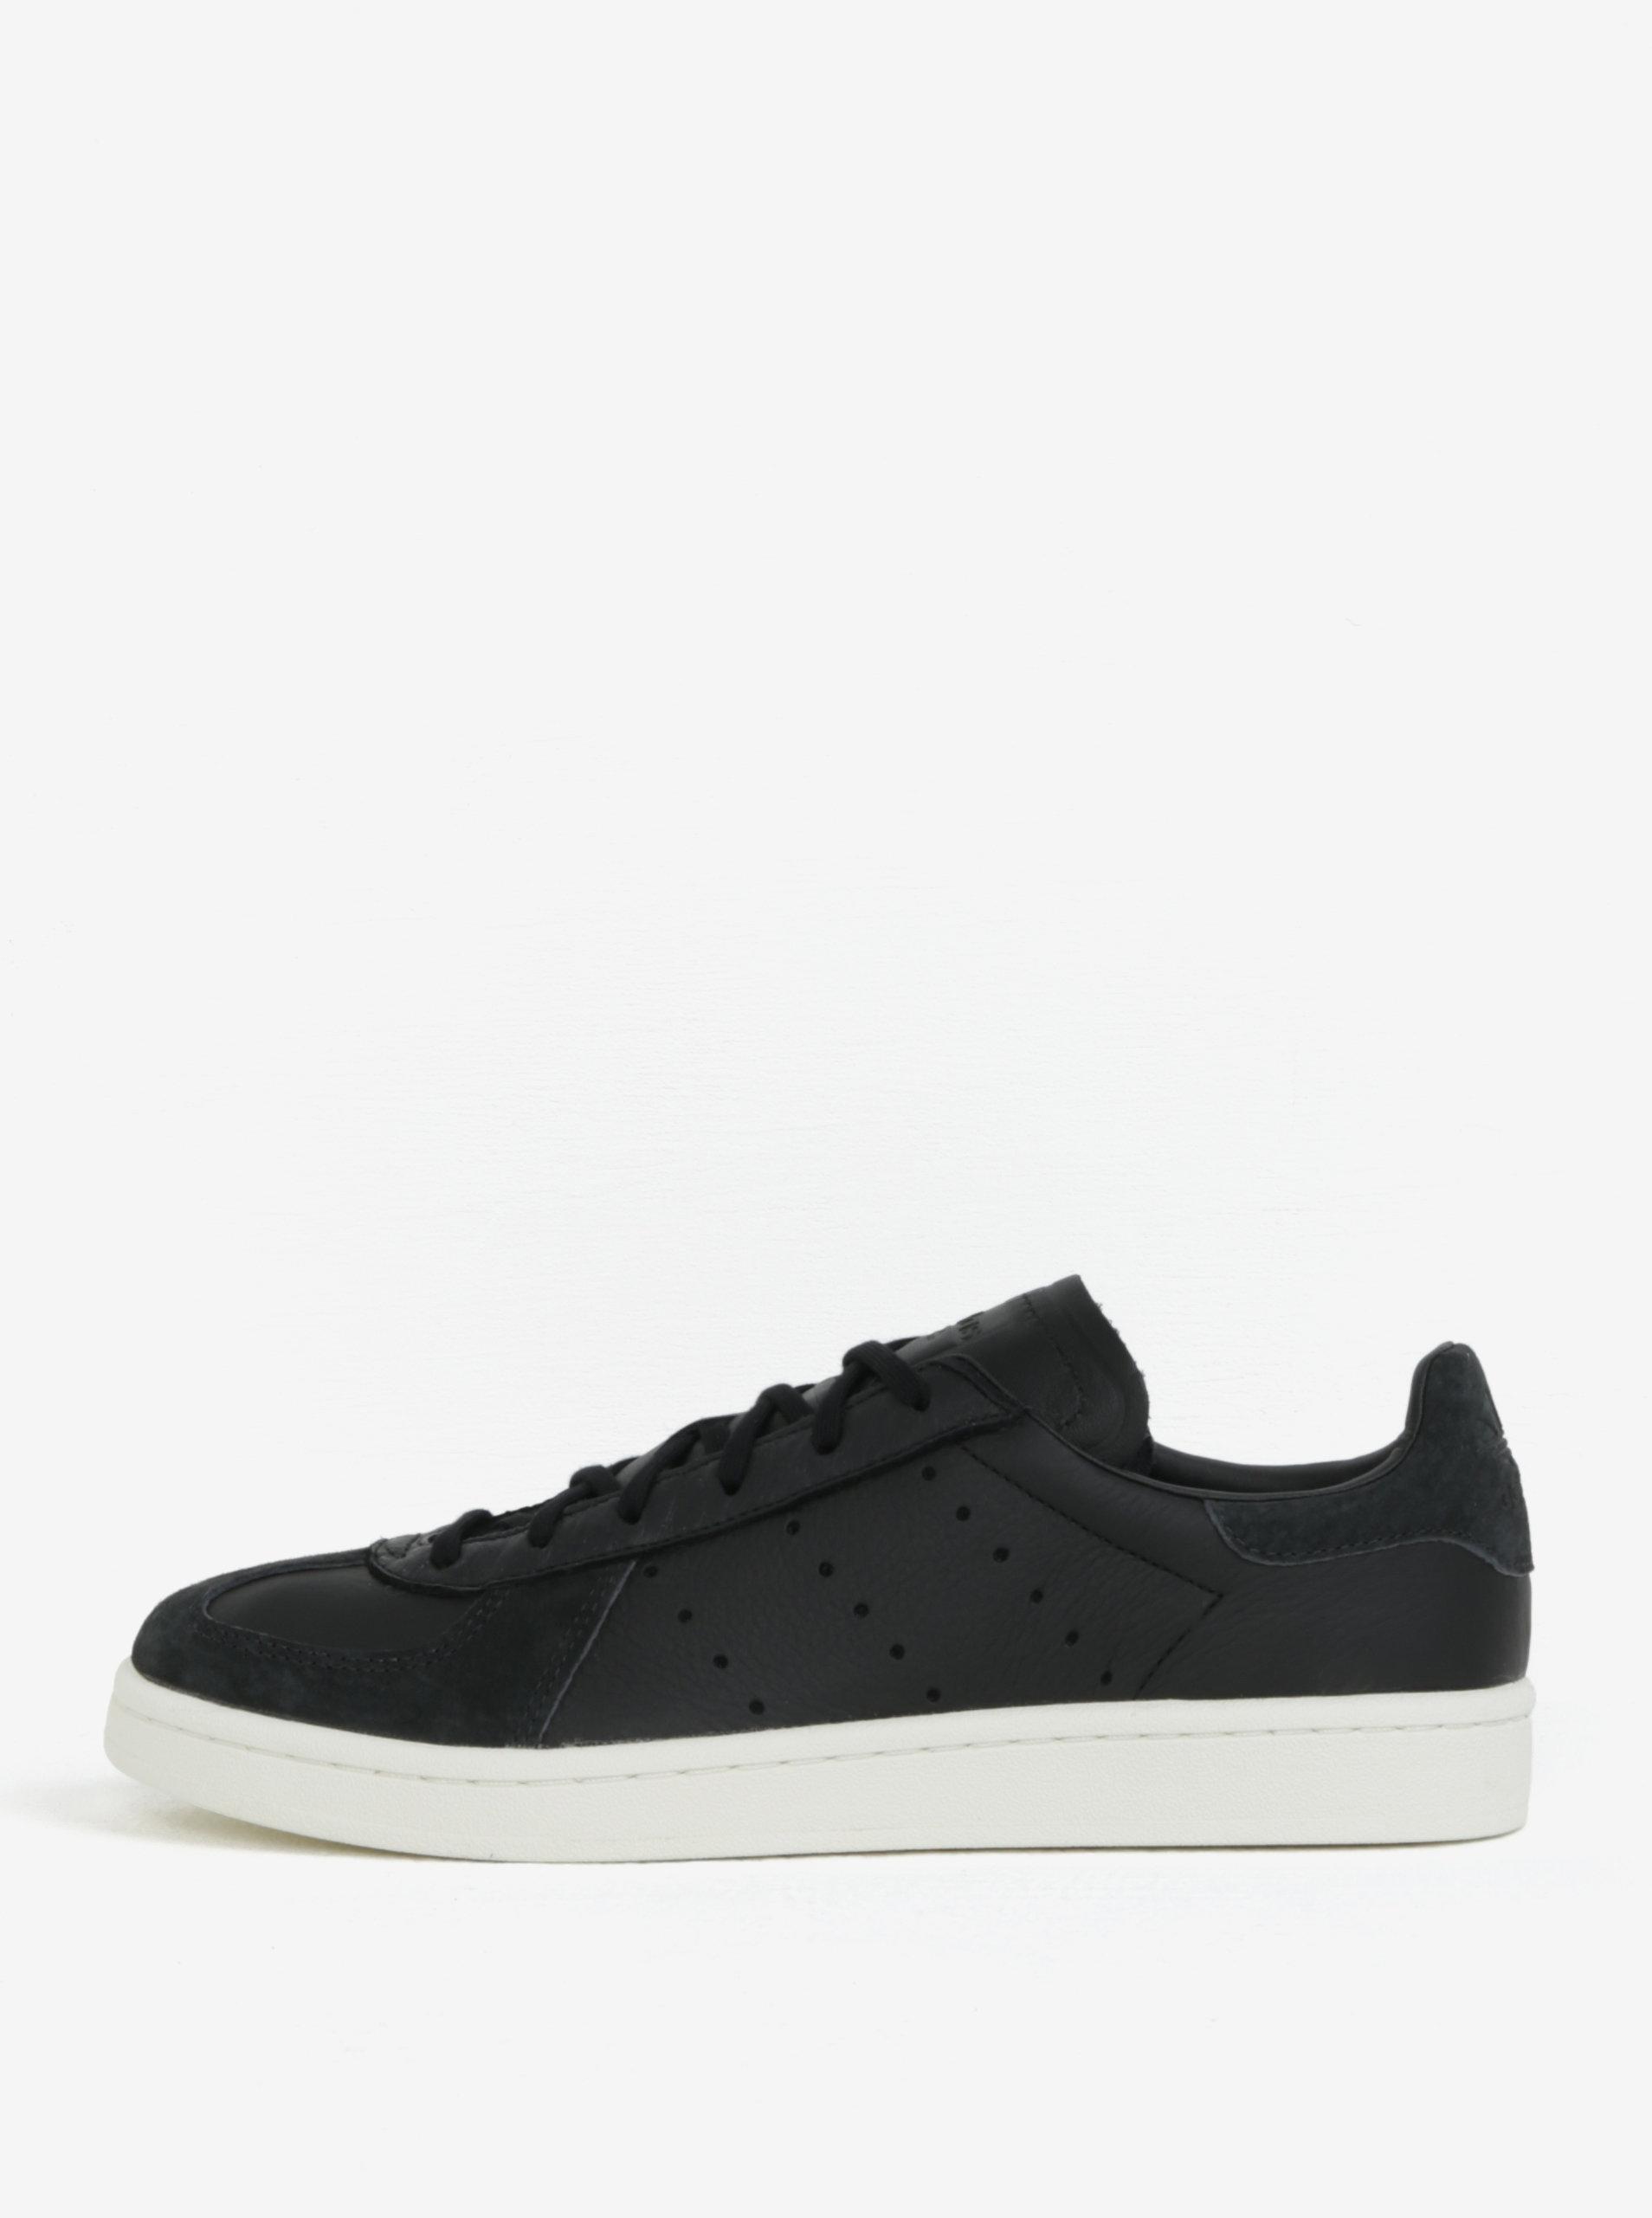 Čierne pánske kožené tenisky adidas Originals Avenue ... 8e46f93a017